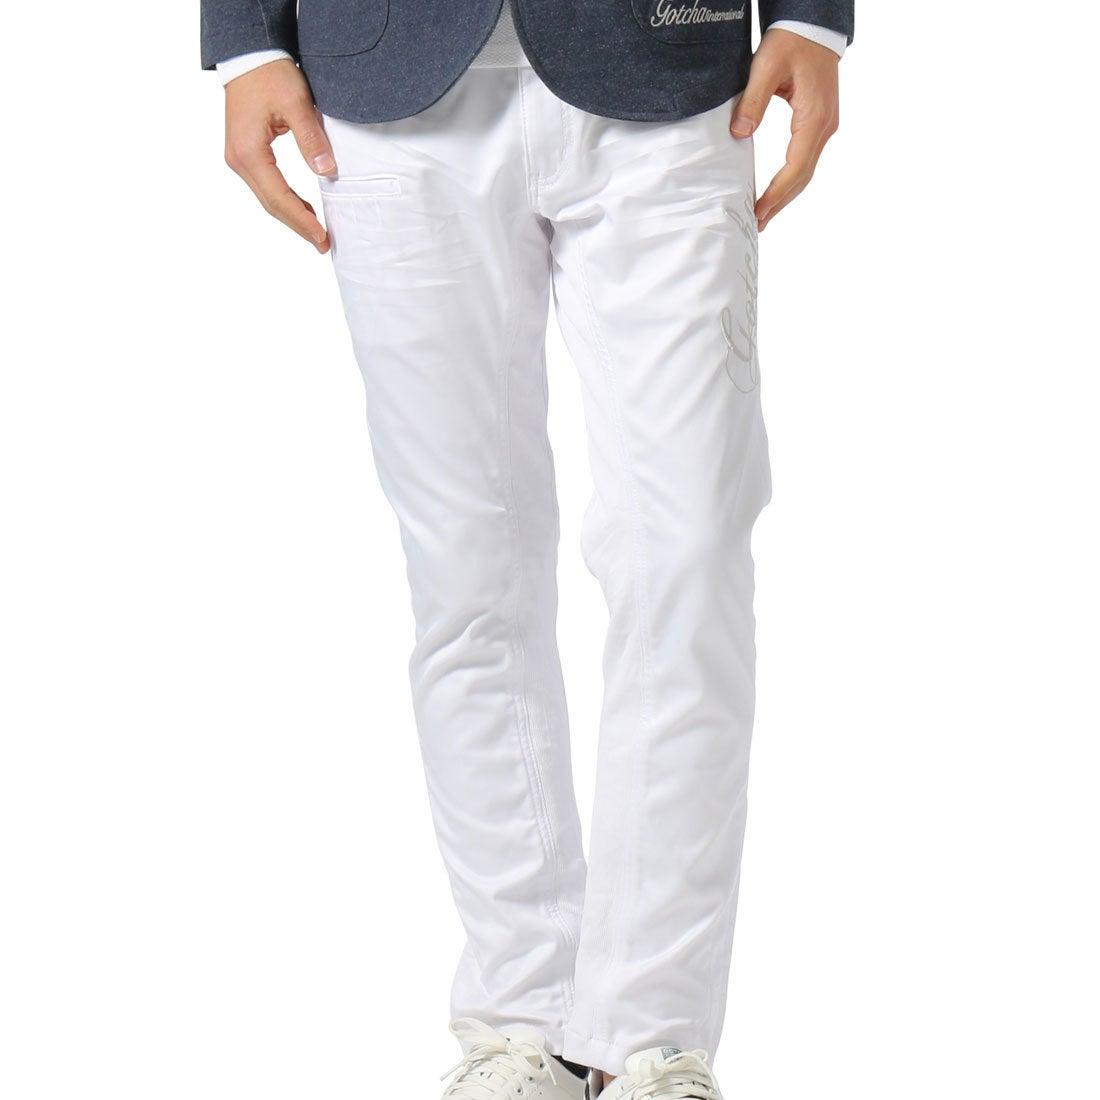 【SALE 25%OFF】ガッチャゴルフ Gotcha Golf リブ使いストレッチパンツ (シロ) メンズ